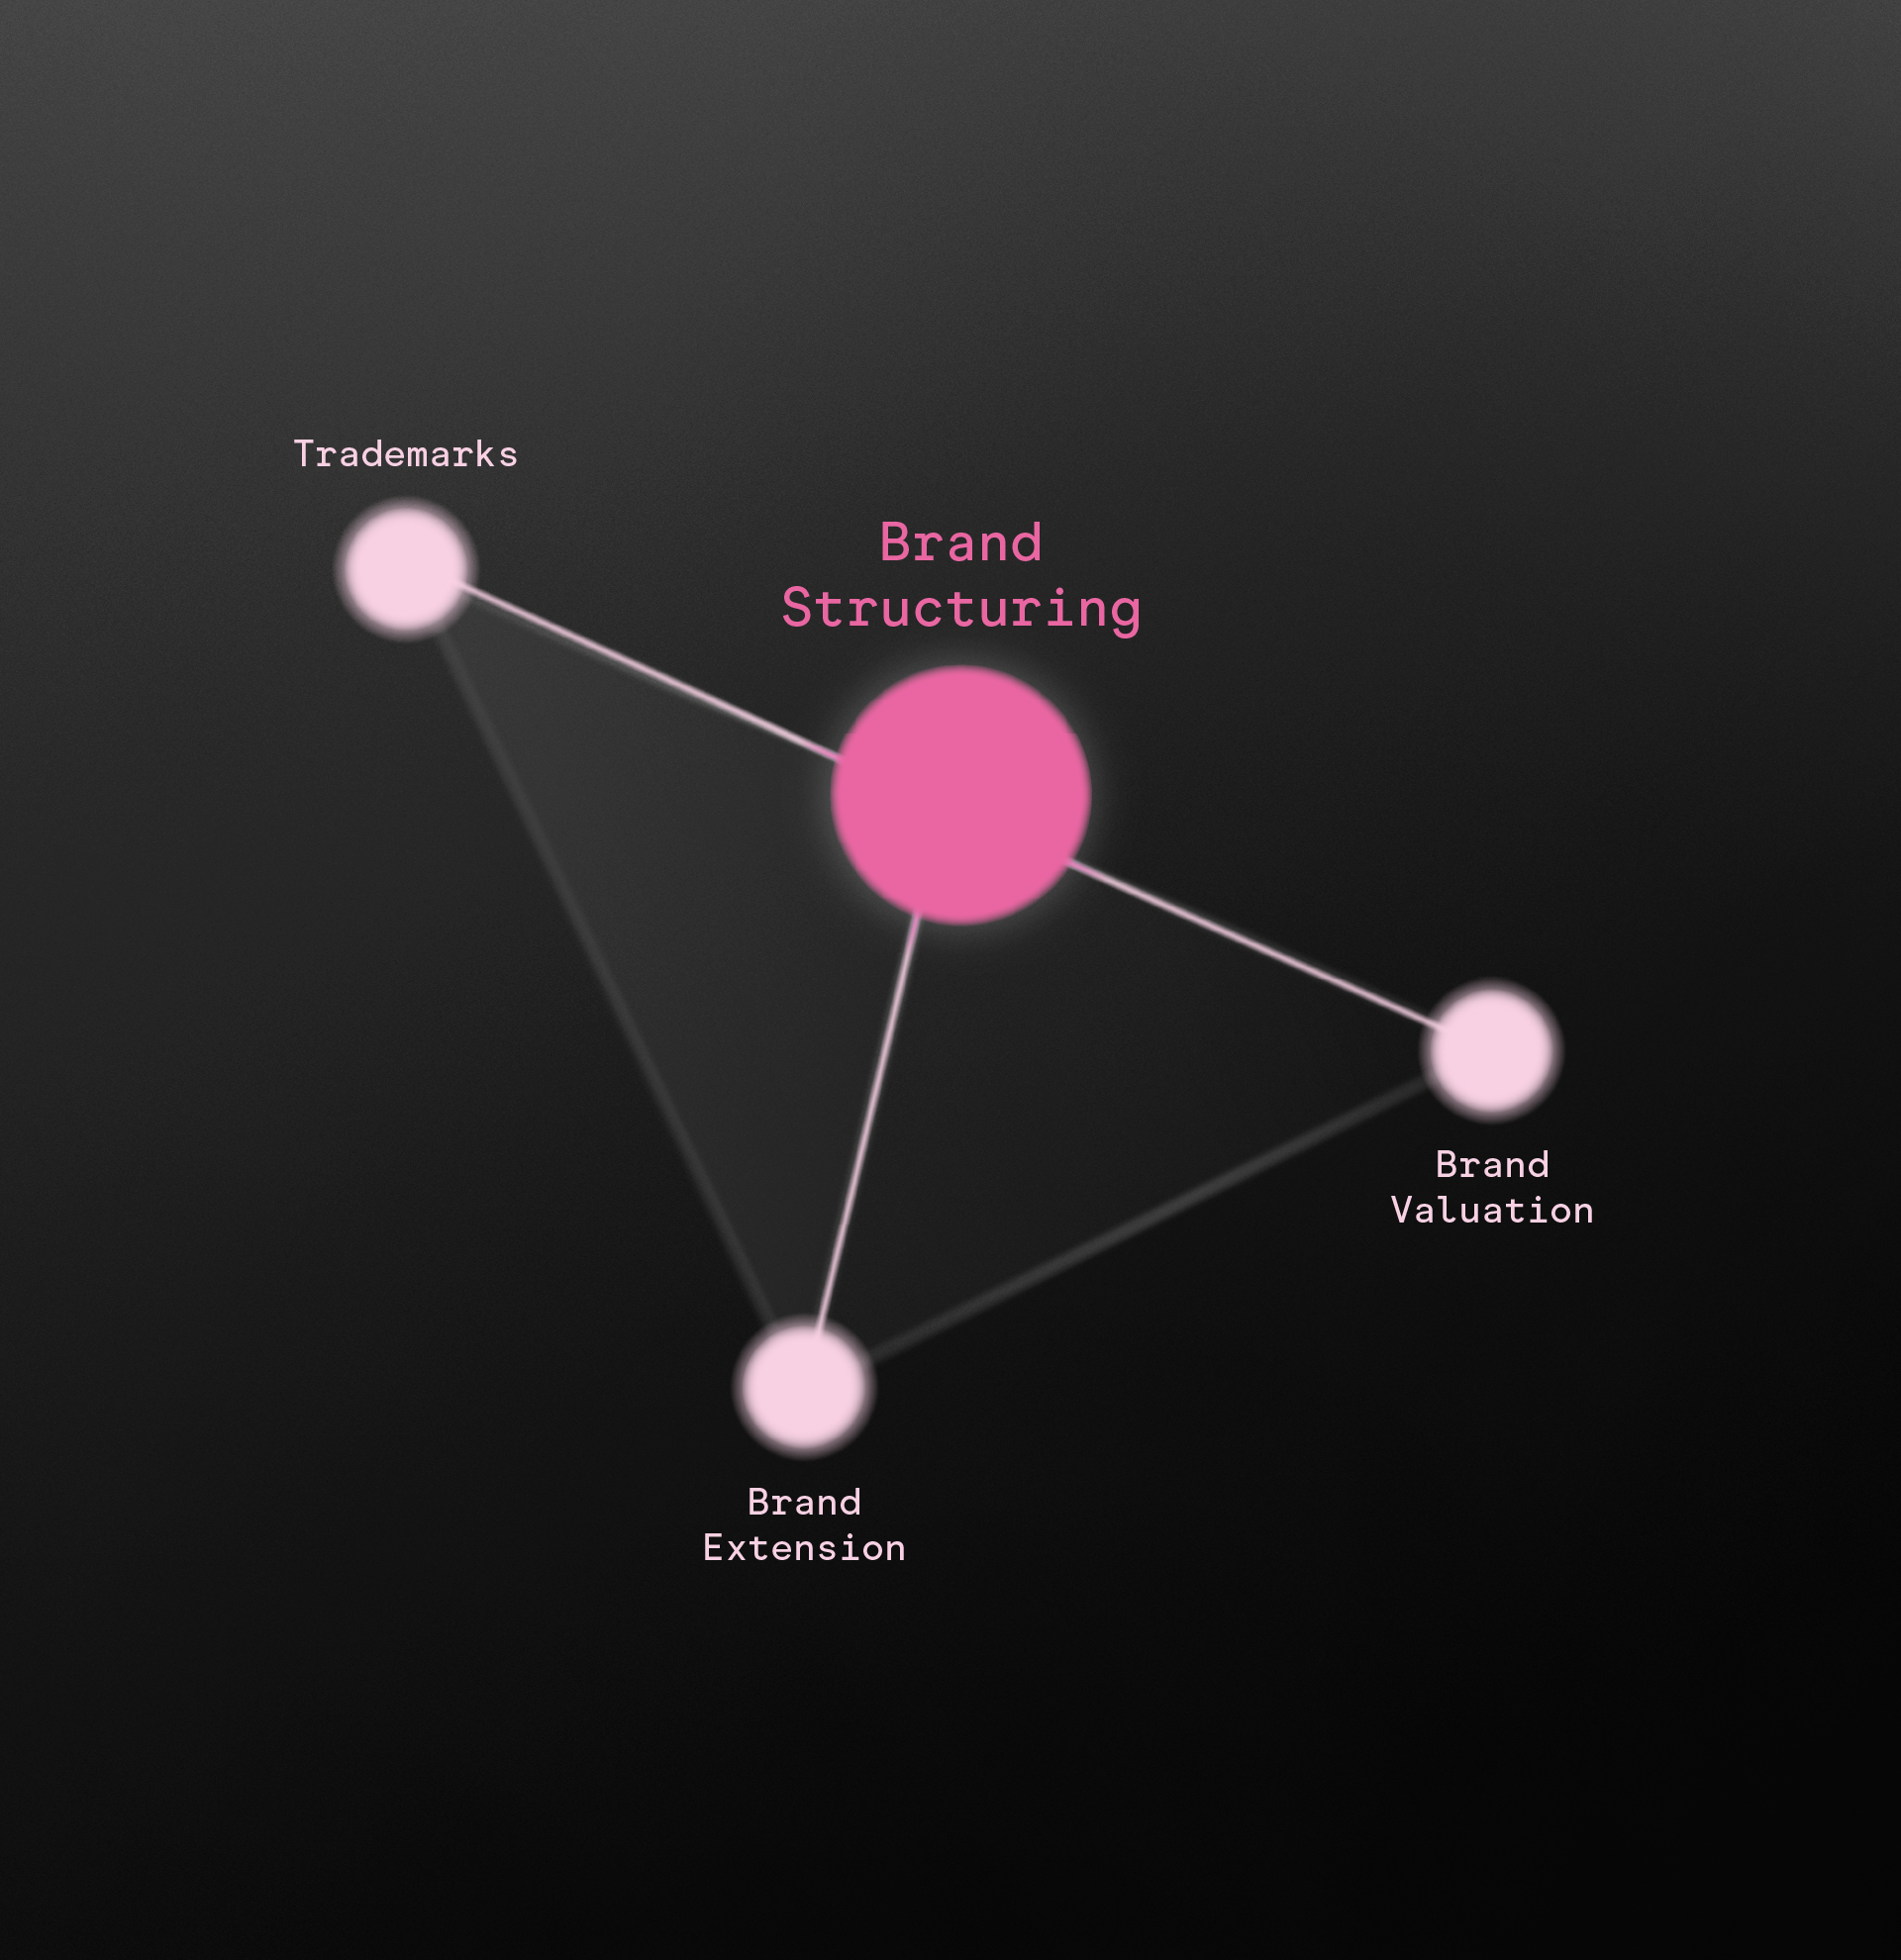 Brand Structuring